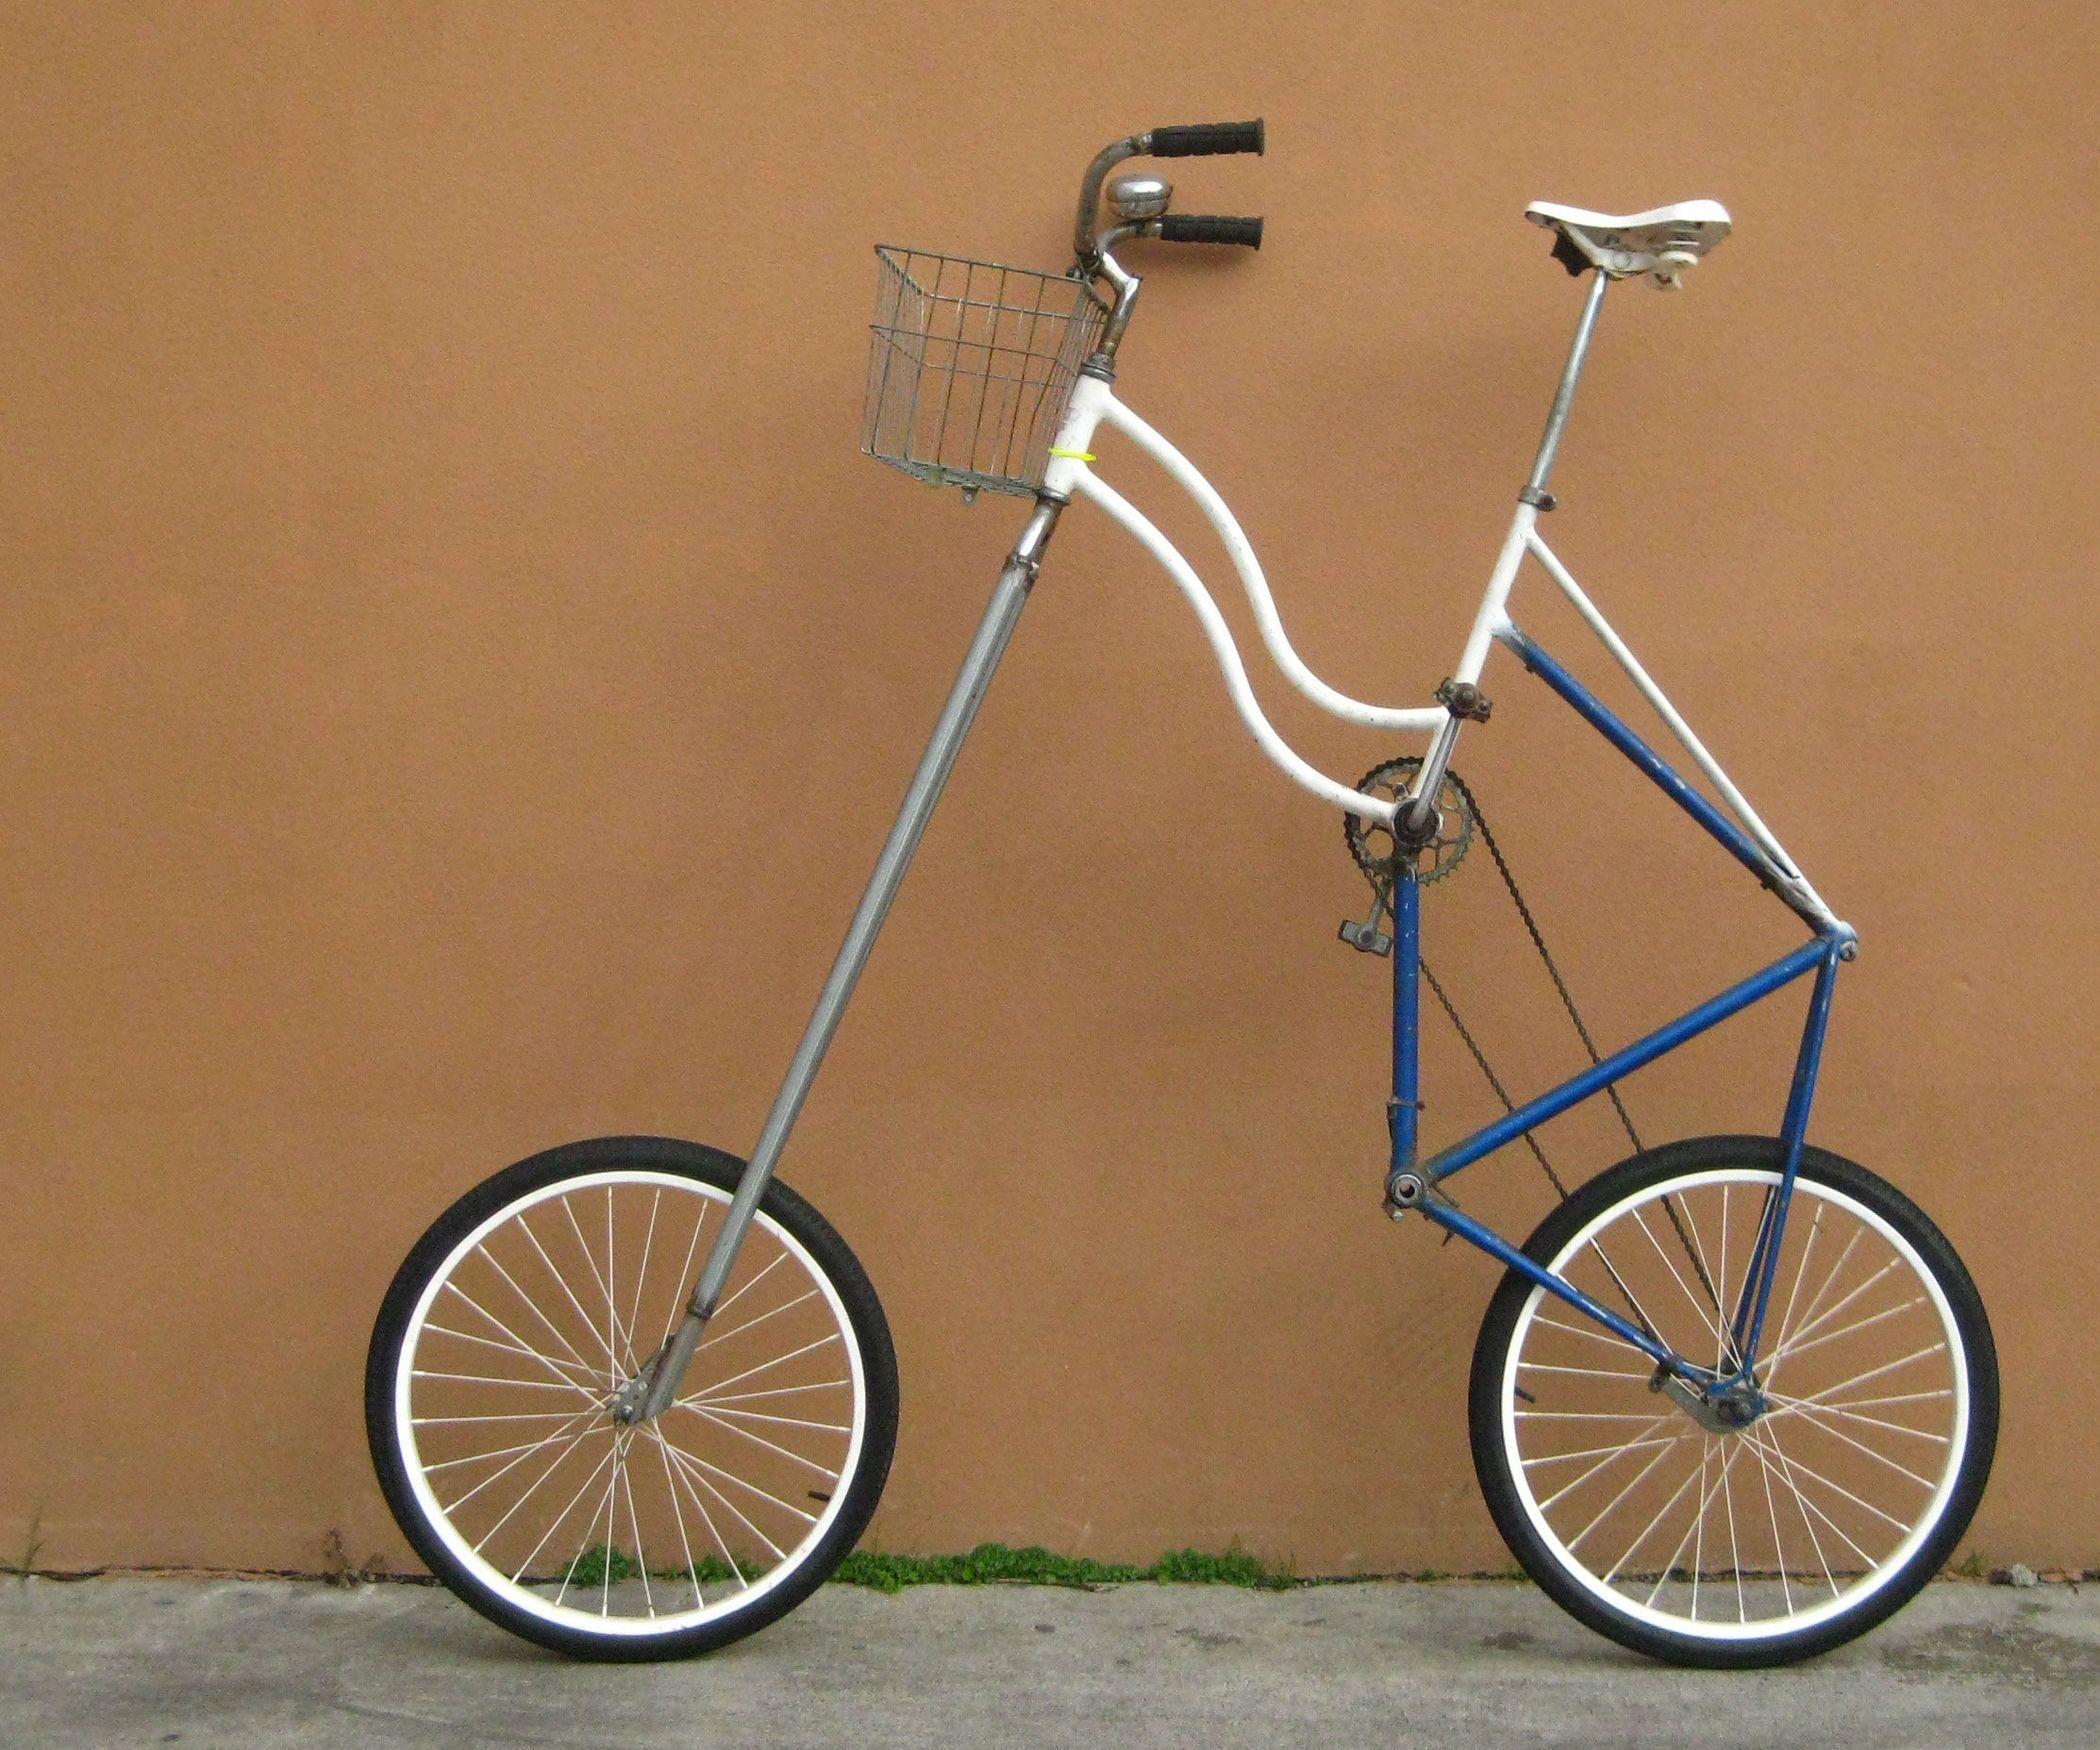 How To Make A High Rider Tall Bike Bike Bicycle Push Bikes